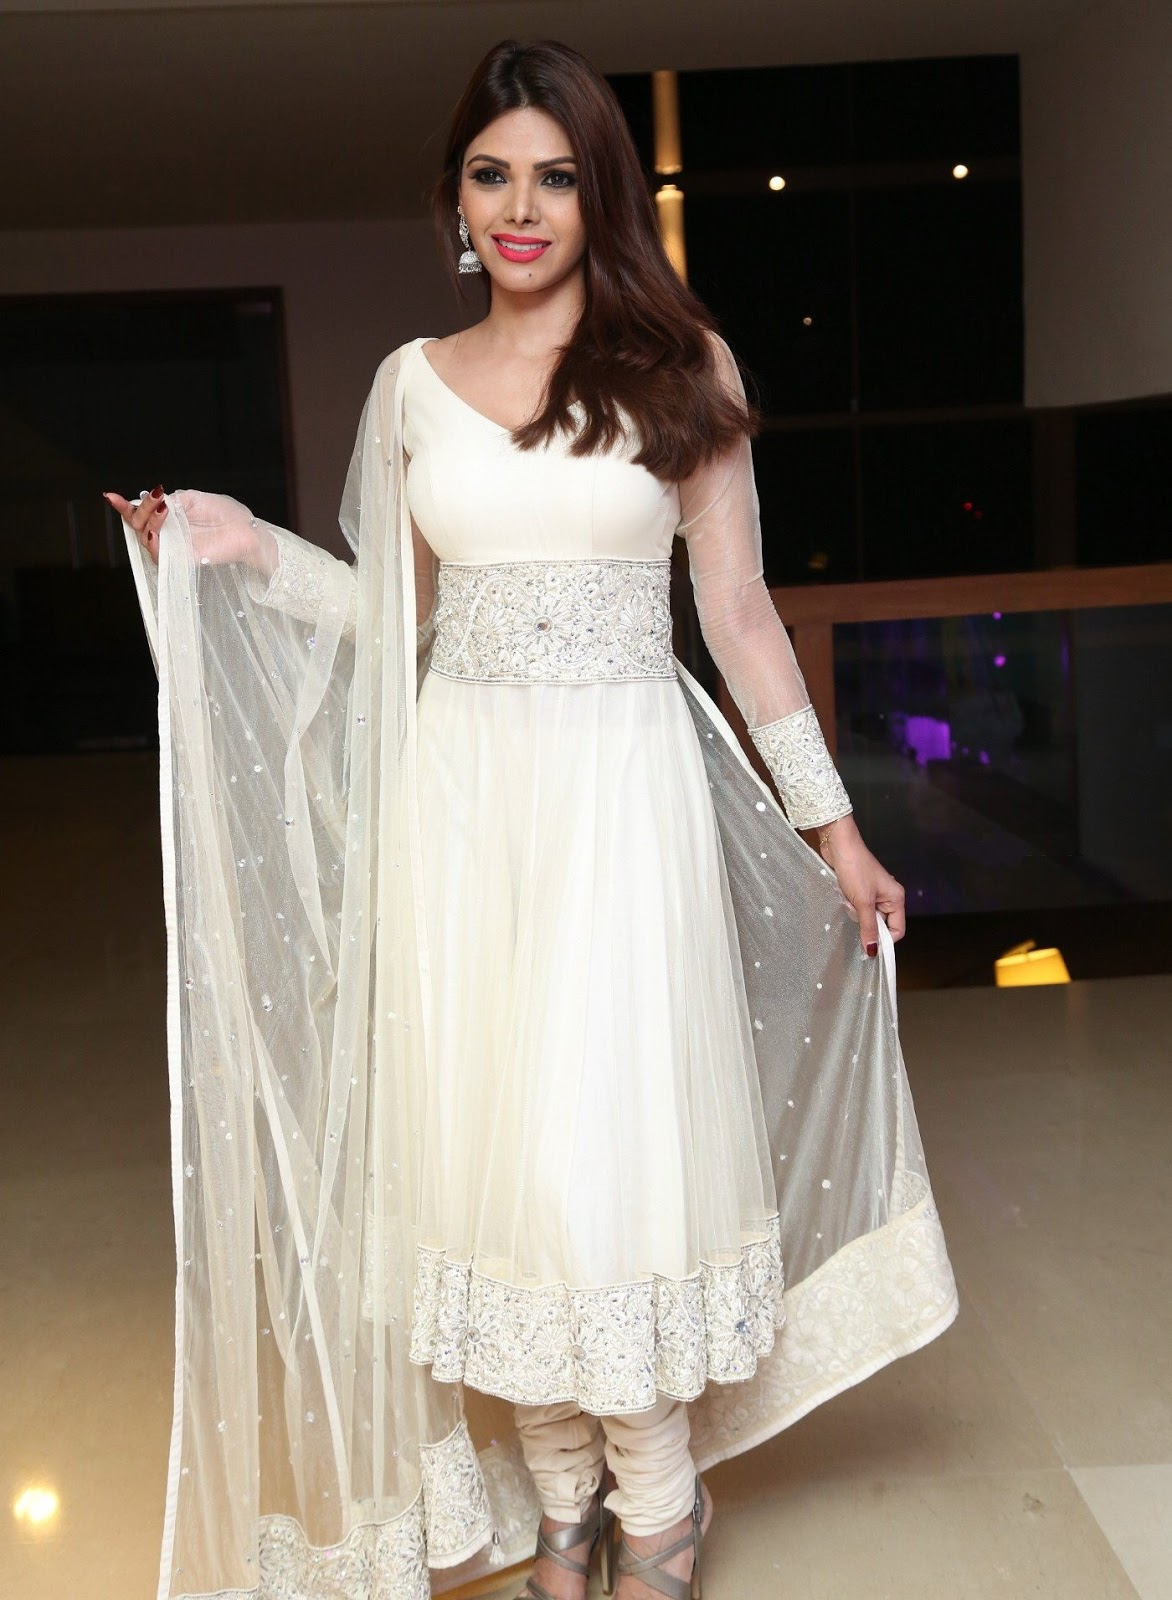 Sherlyn Chopra Looks Super Hot In White Dress At Dj Inayah -7209